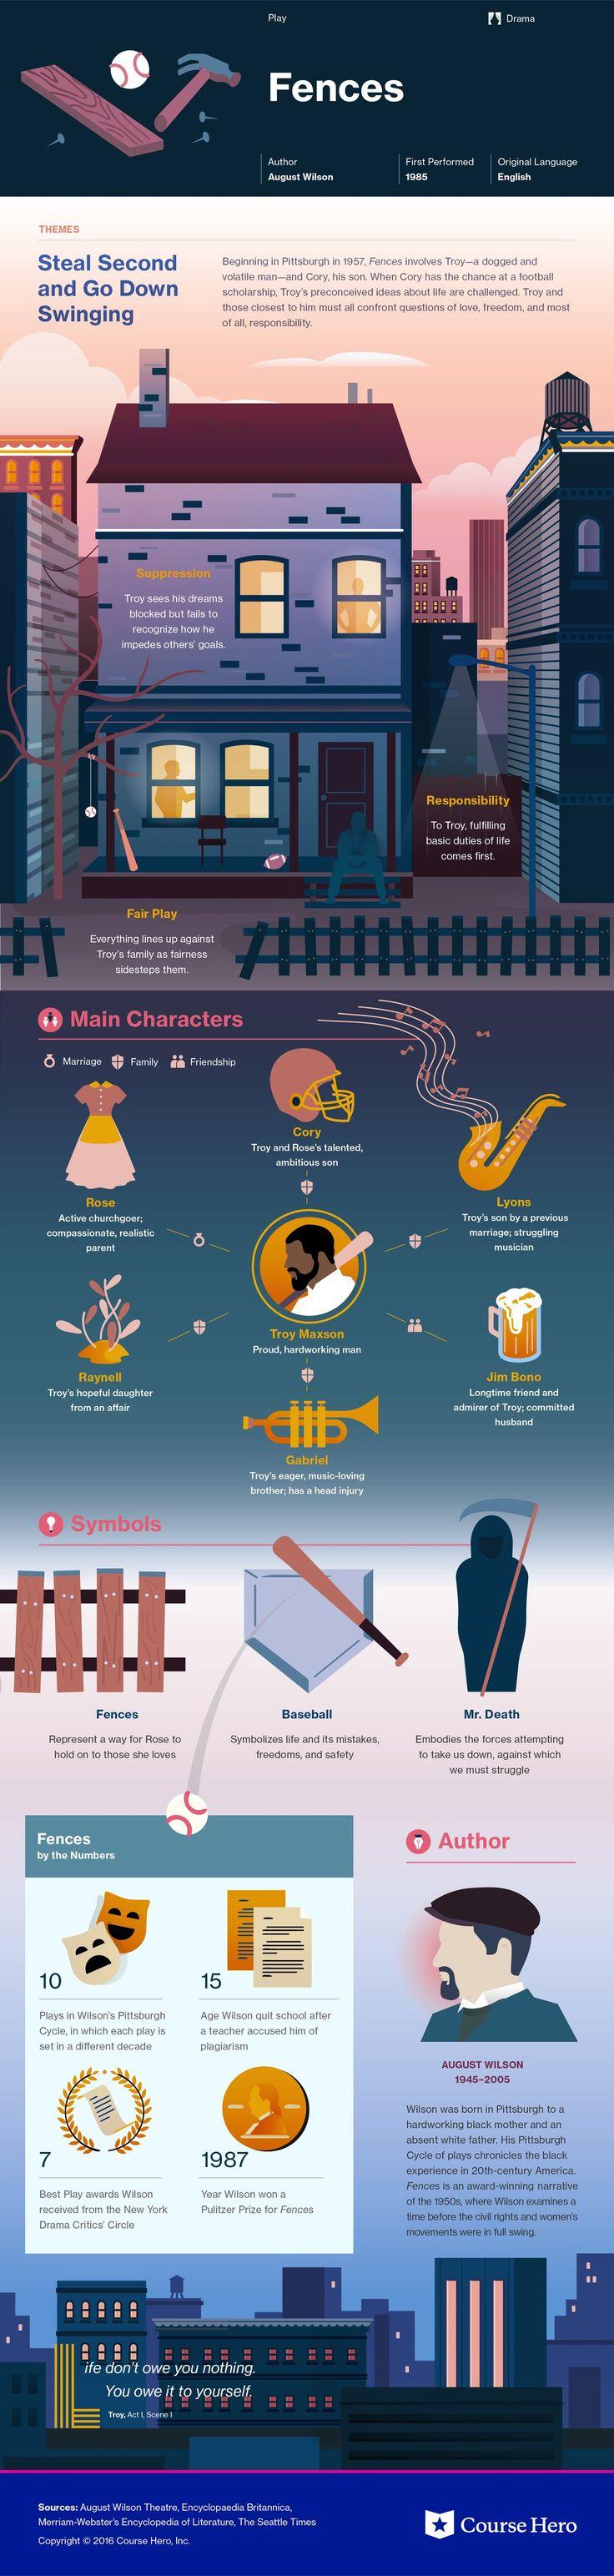 Fences Infographic | Course Hero